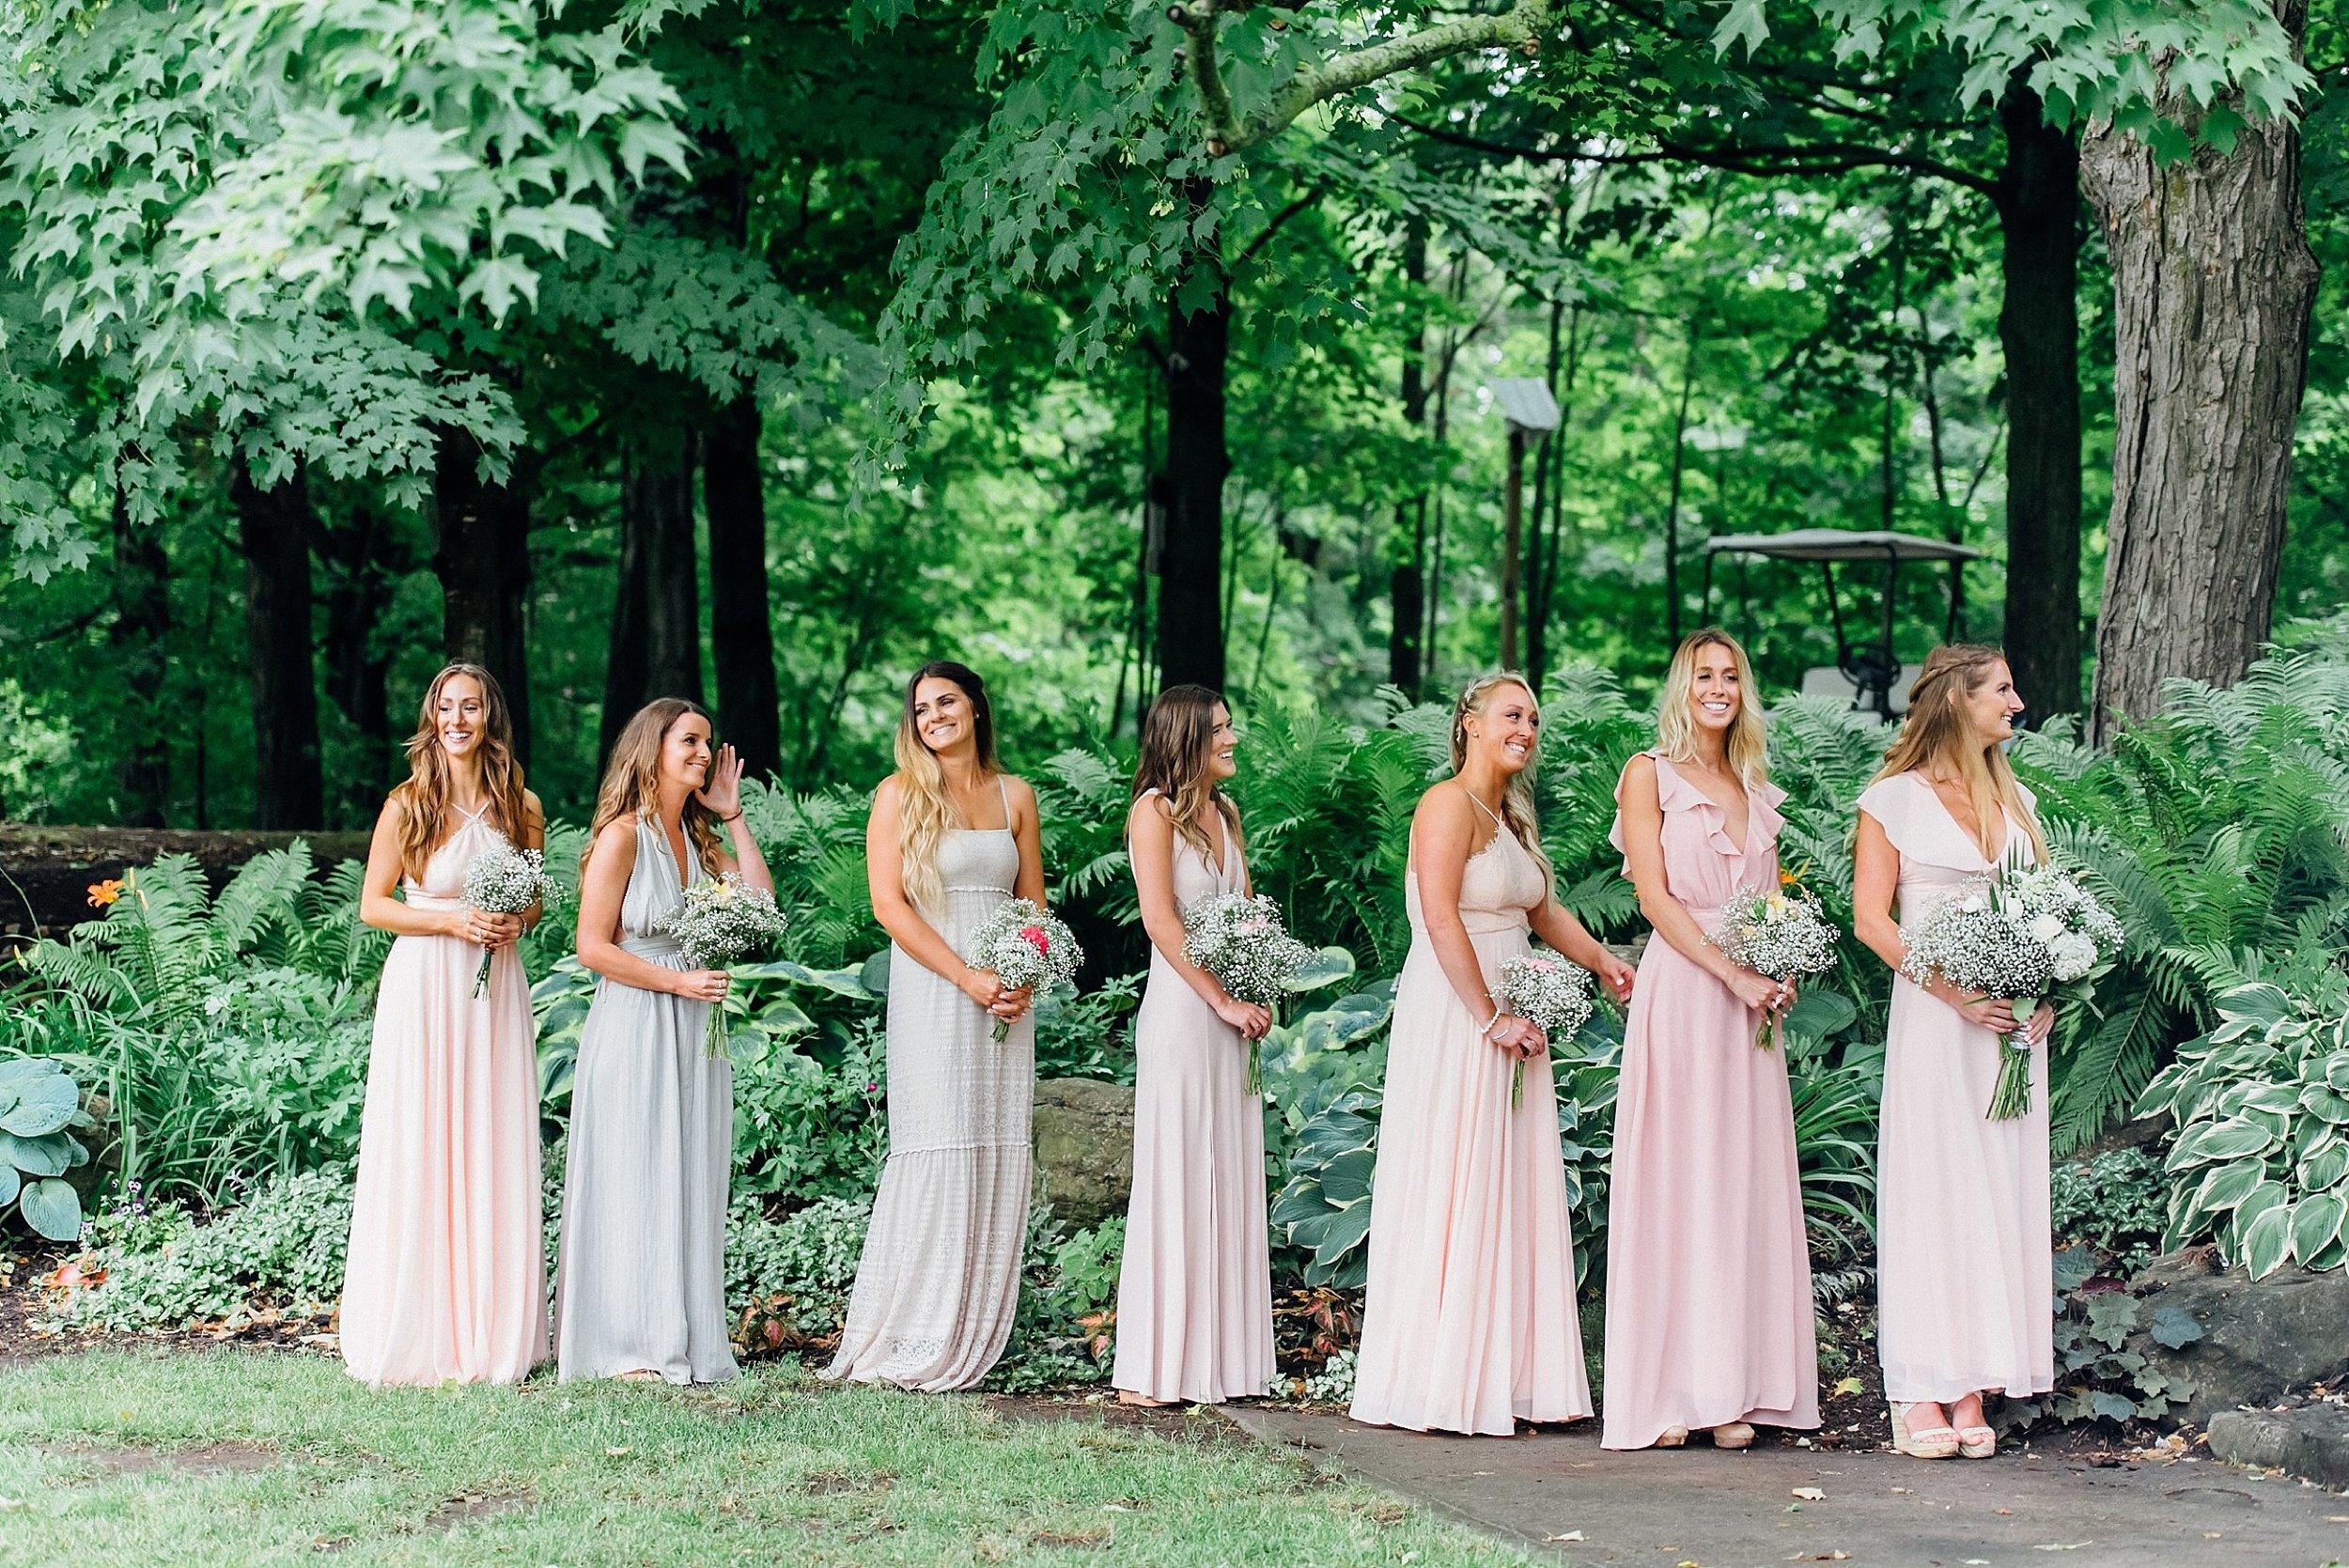 Ottawa Wedding Photographer - Stanley's Olde Maple Lane Barn Wedding - Ali & Batoul Photography_0025.jpg